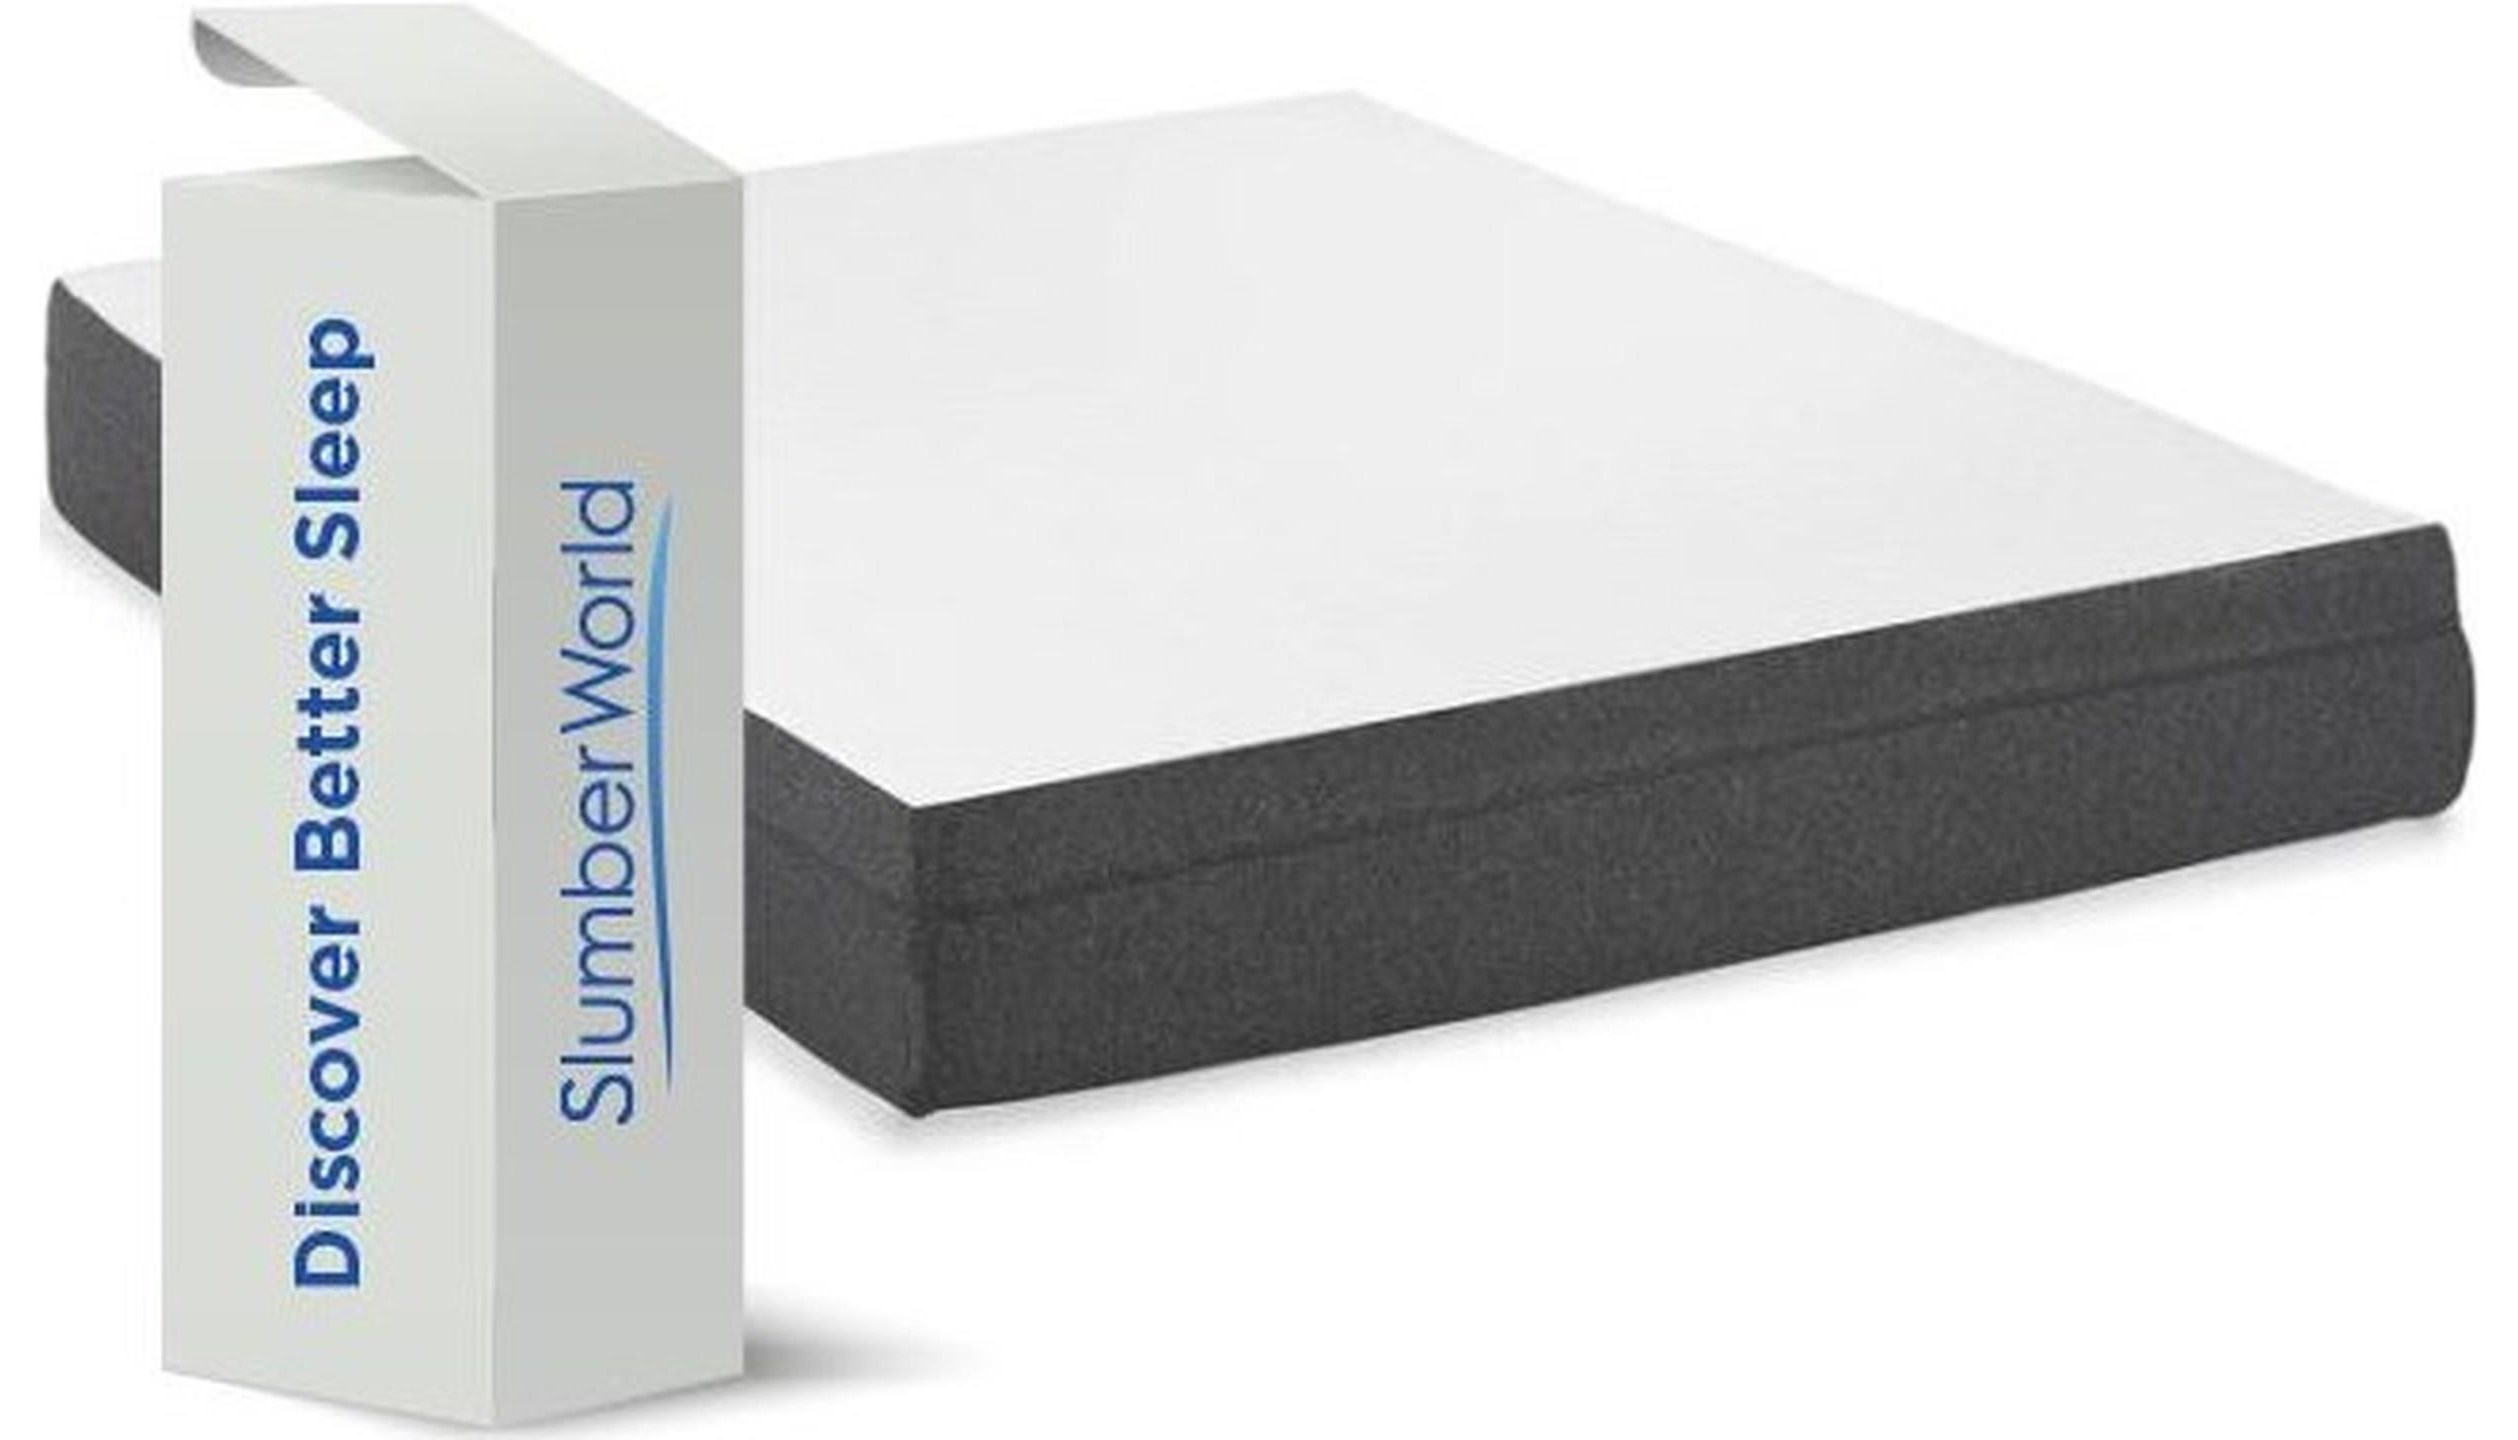 SB10 SB10 Cal King Hybrid Mattress in a Box by South Bay International at HomeWorld Furniture